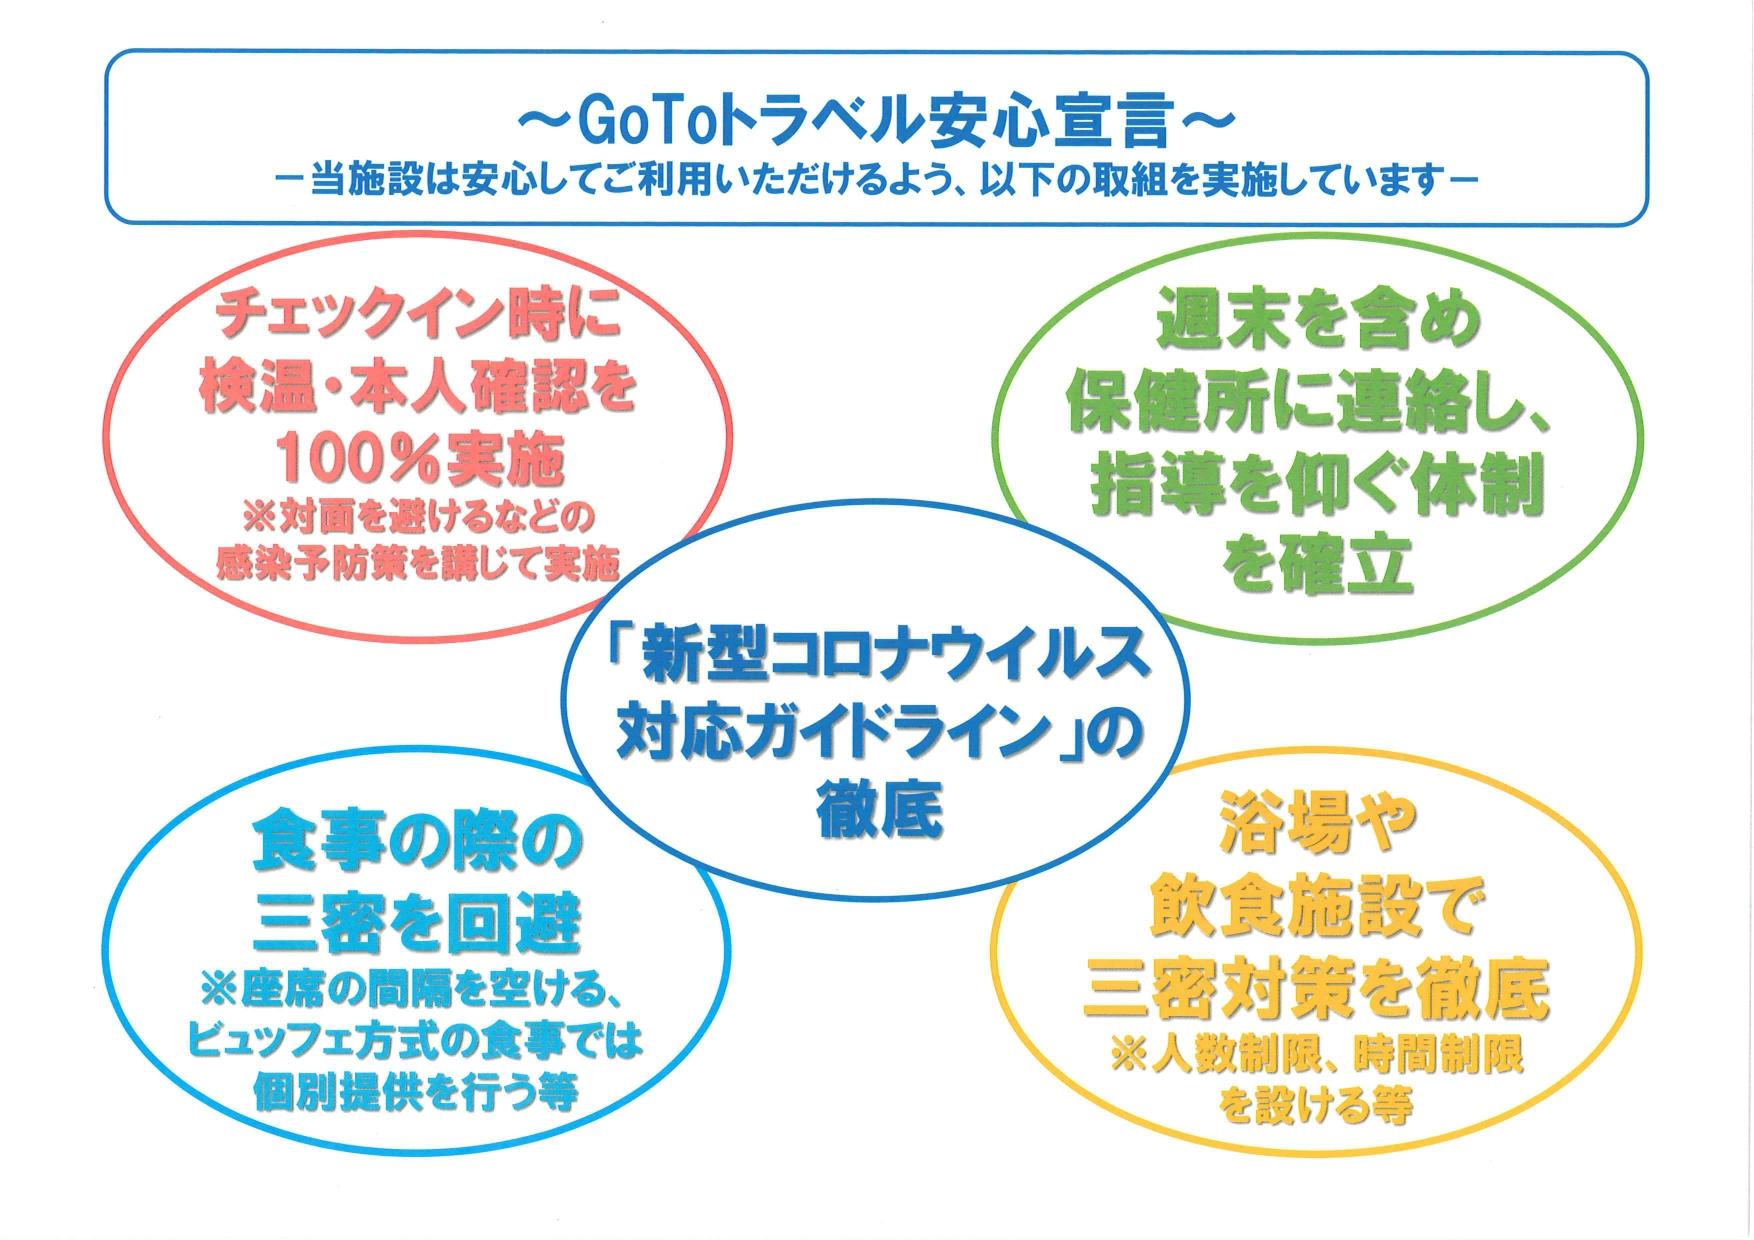 GoToトラベルキャンペーン 安心宣言